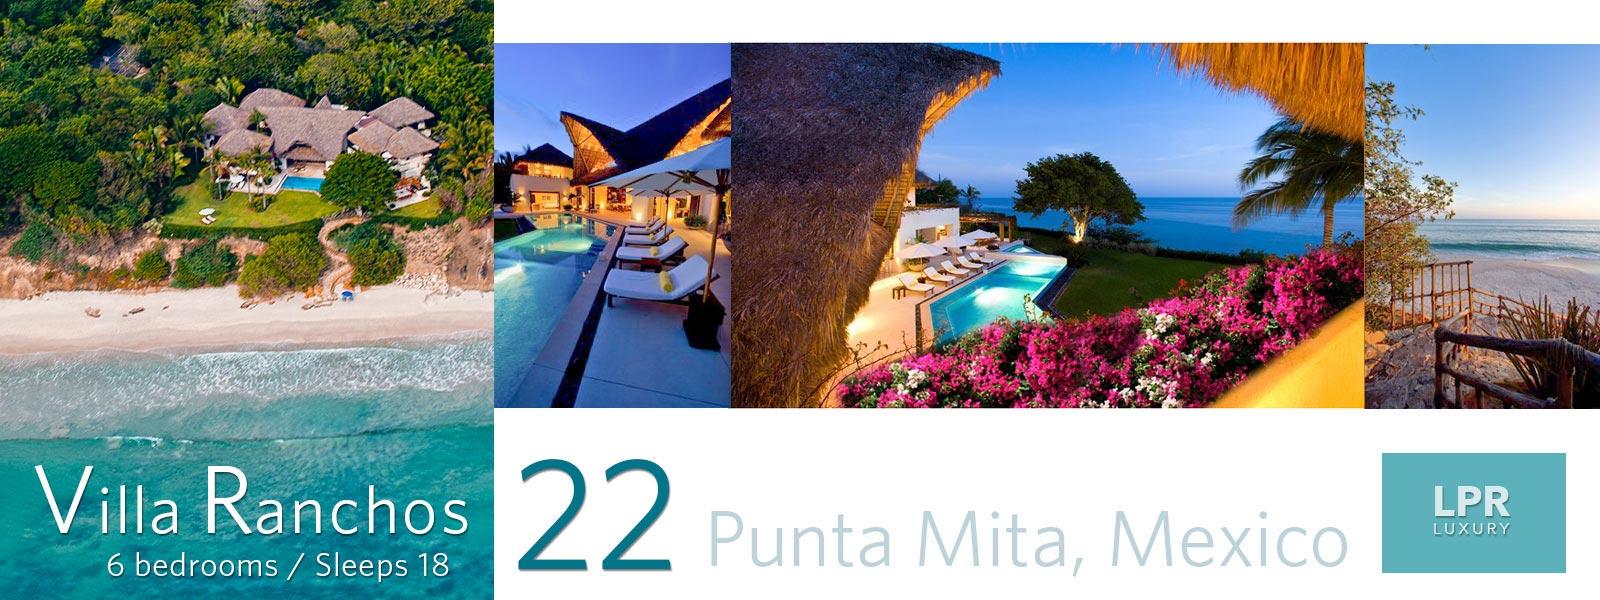 Villa Ranchos 22 - Punta Mita Resort, Riviera Nayarit, Mexico